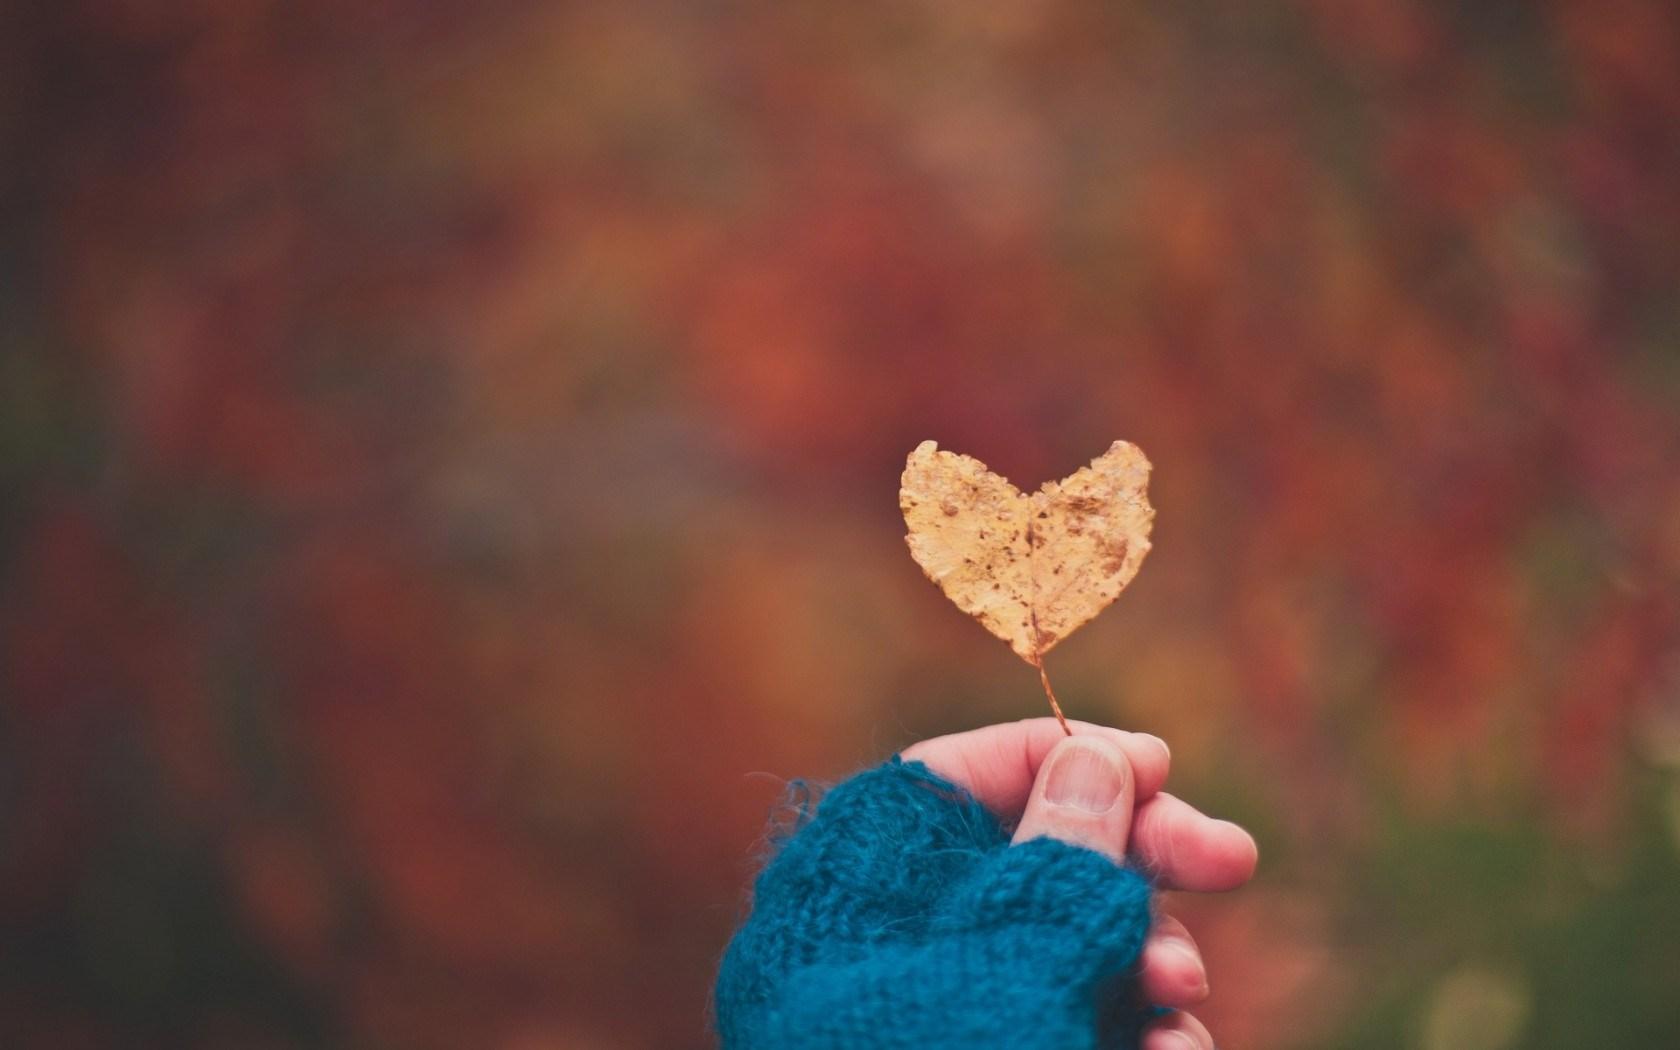 Mood Leaf Heart Hand Girl Love